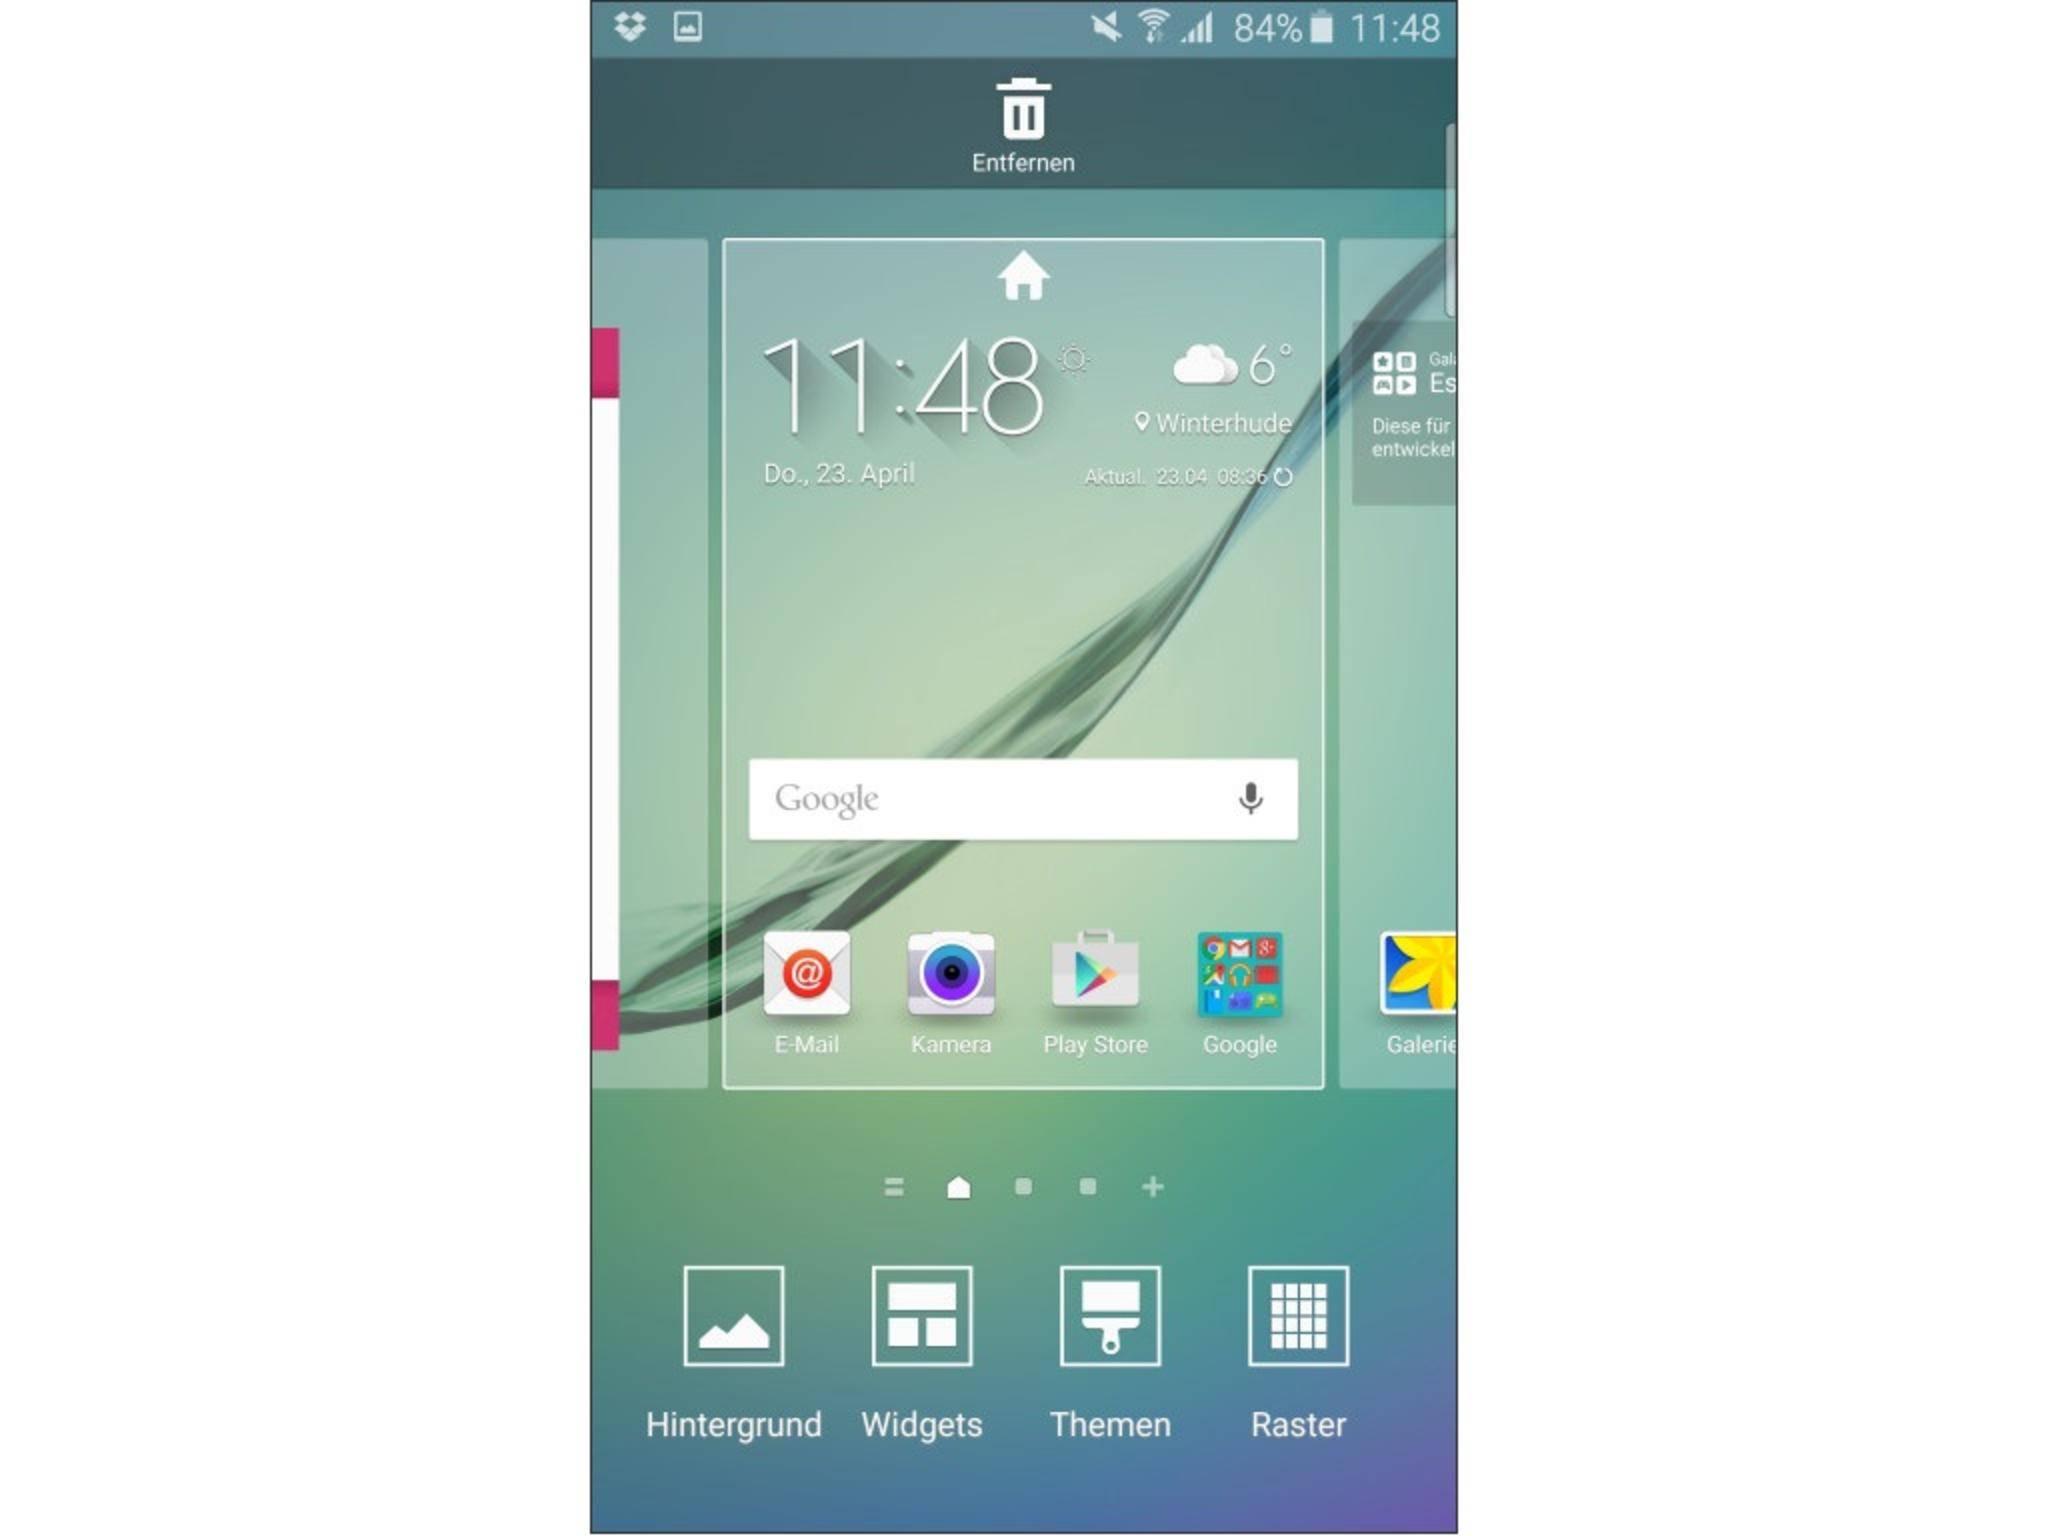 Galaxy S6 Screenshot 8